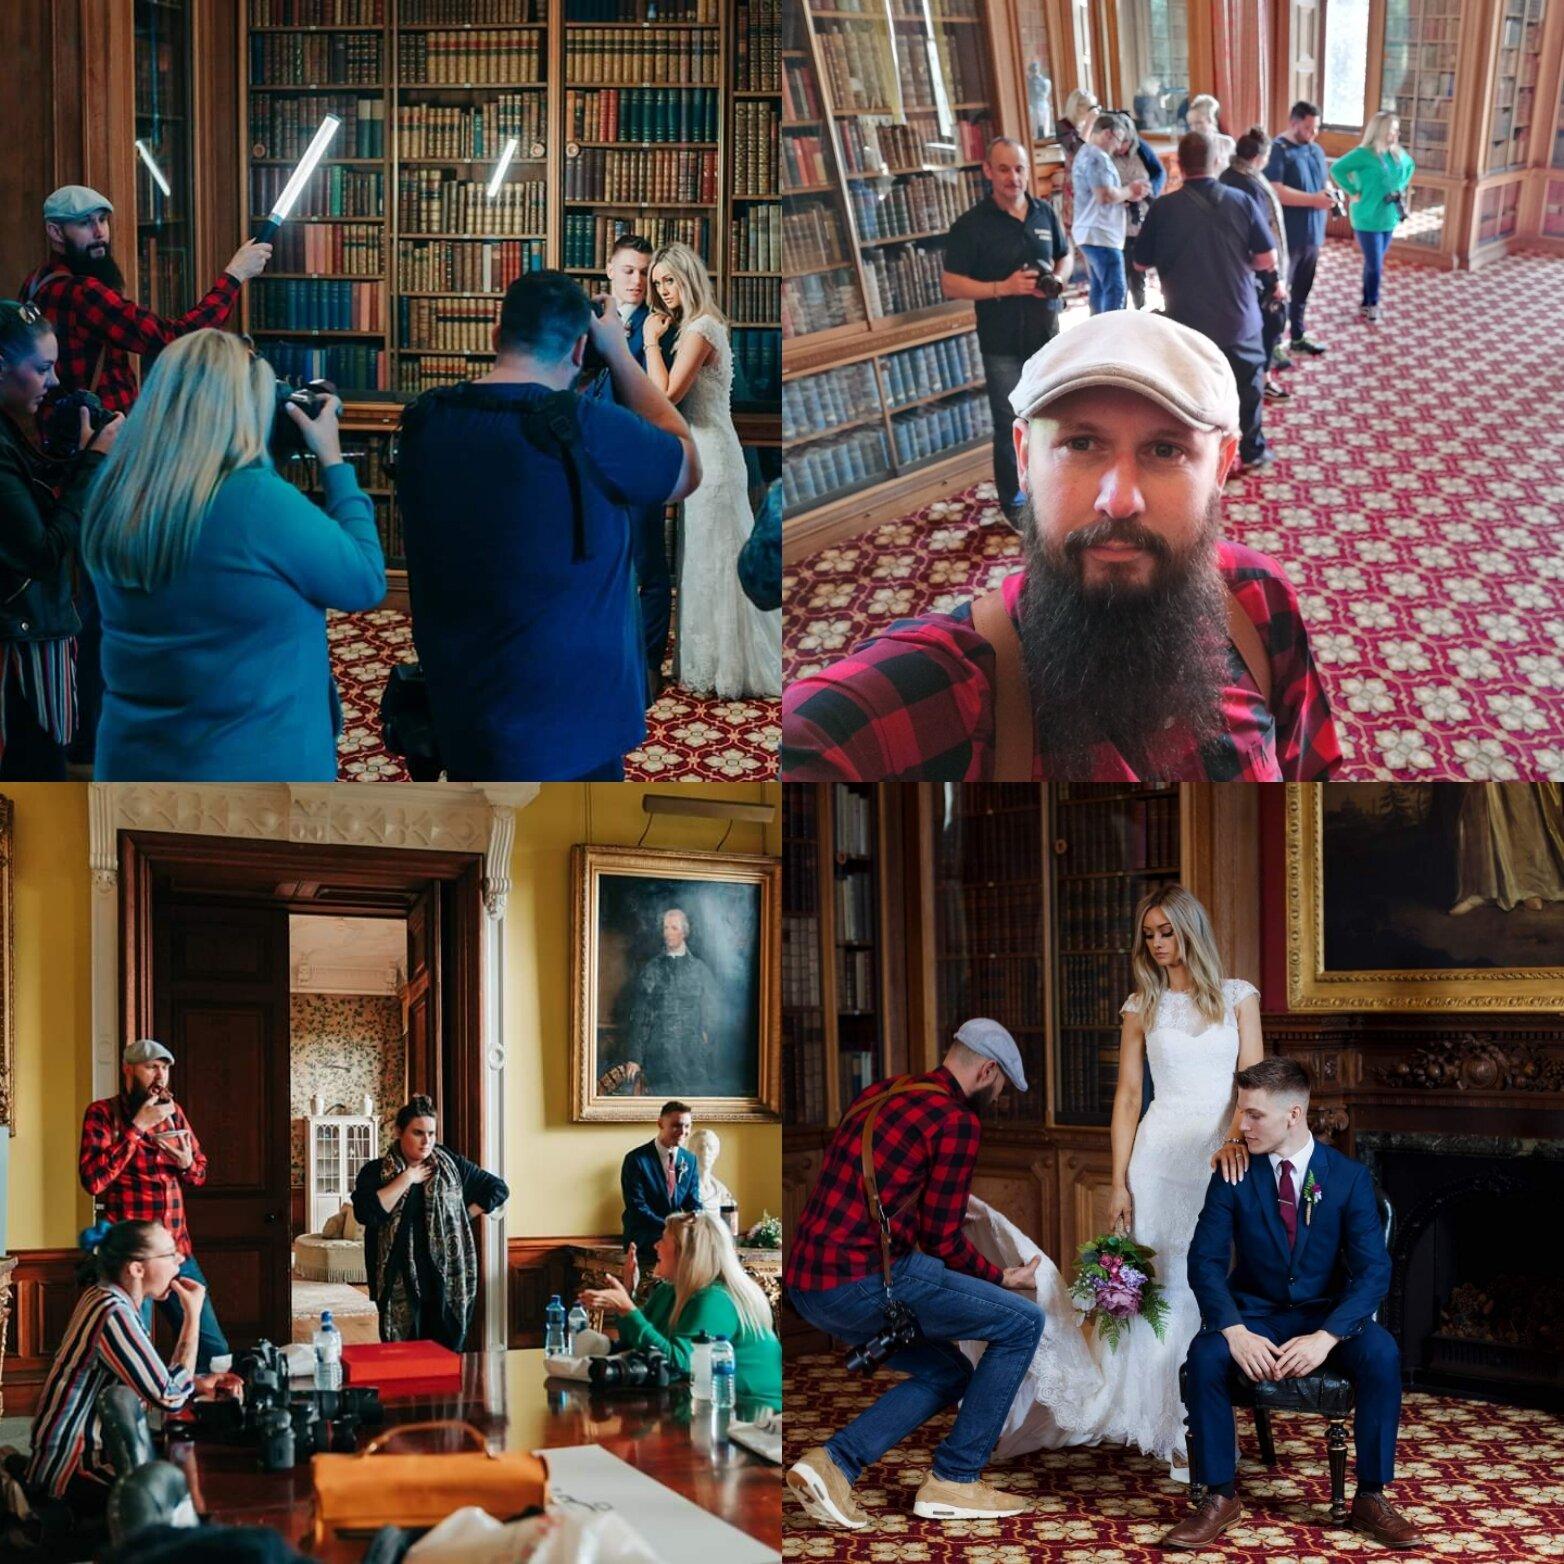 Behind the scenes, wedding workshop in partnership with Samyang Lenses UK September 11th 2019